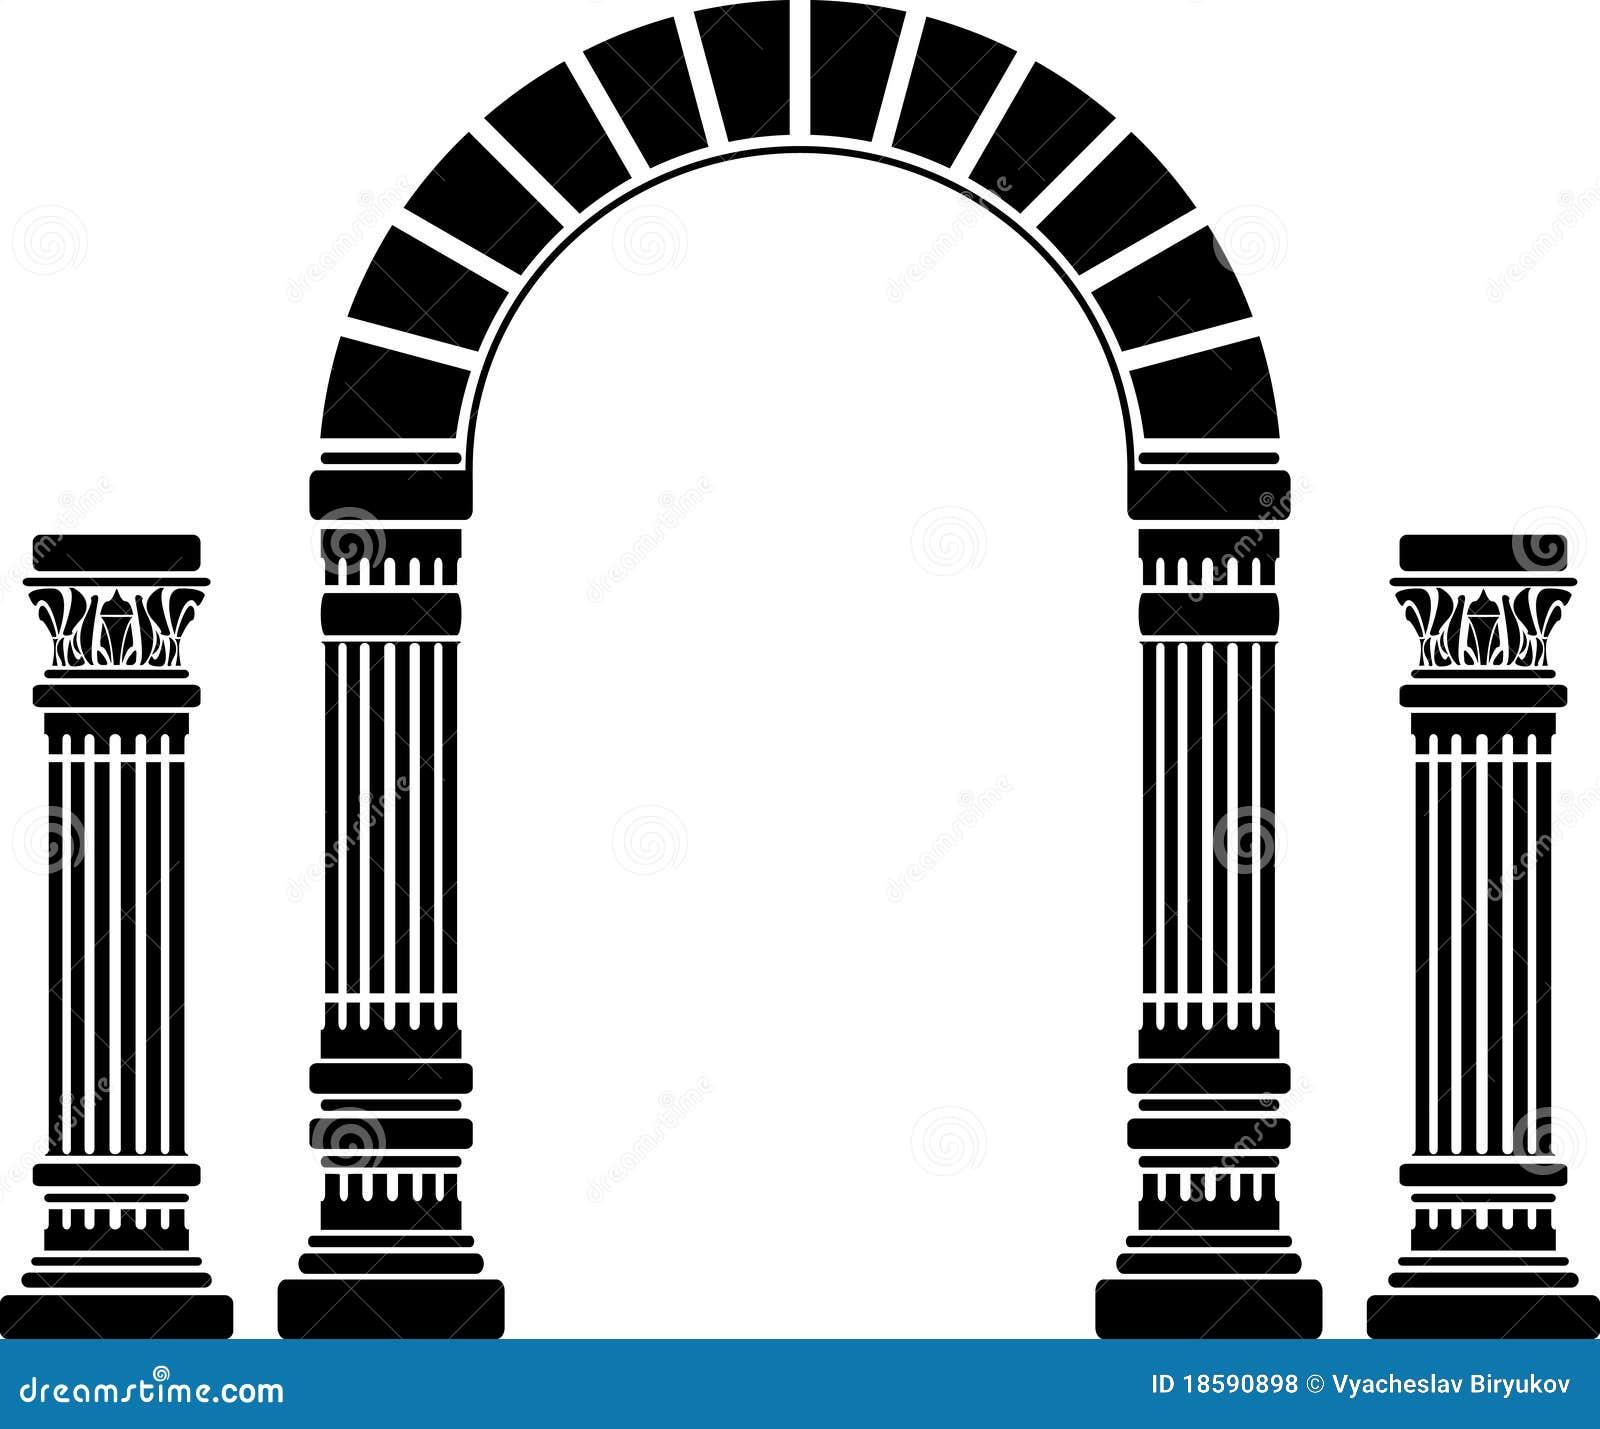 Flat Entrance Wall Design